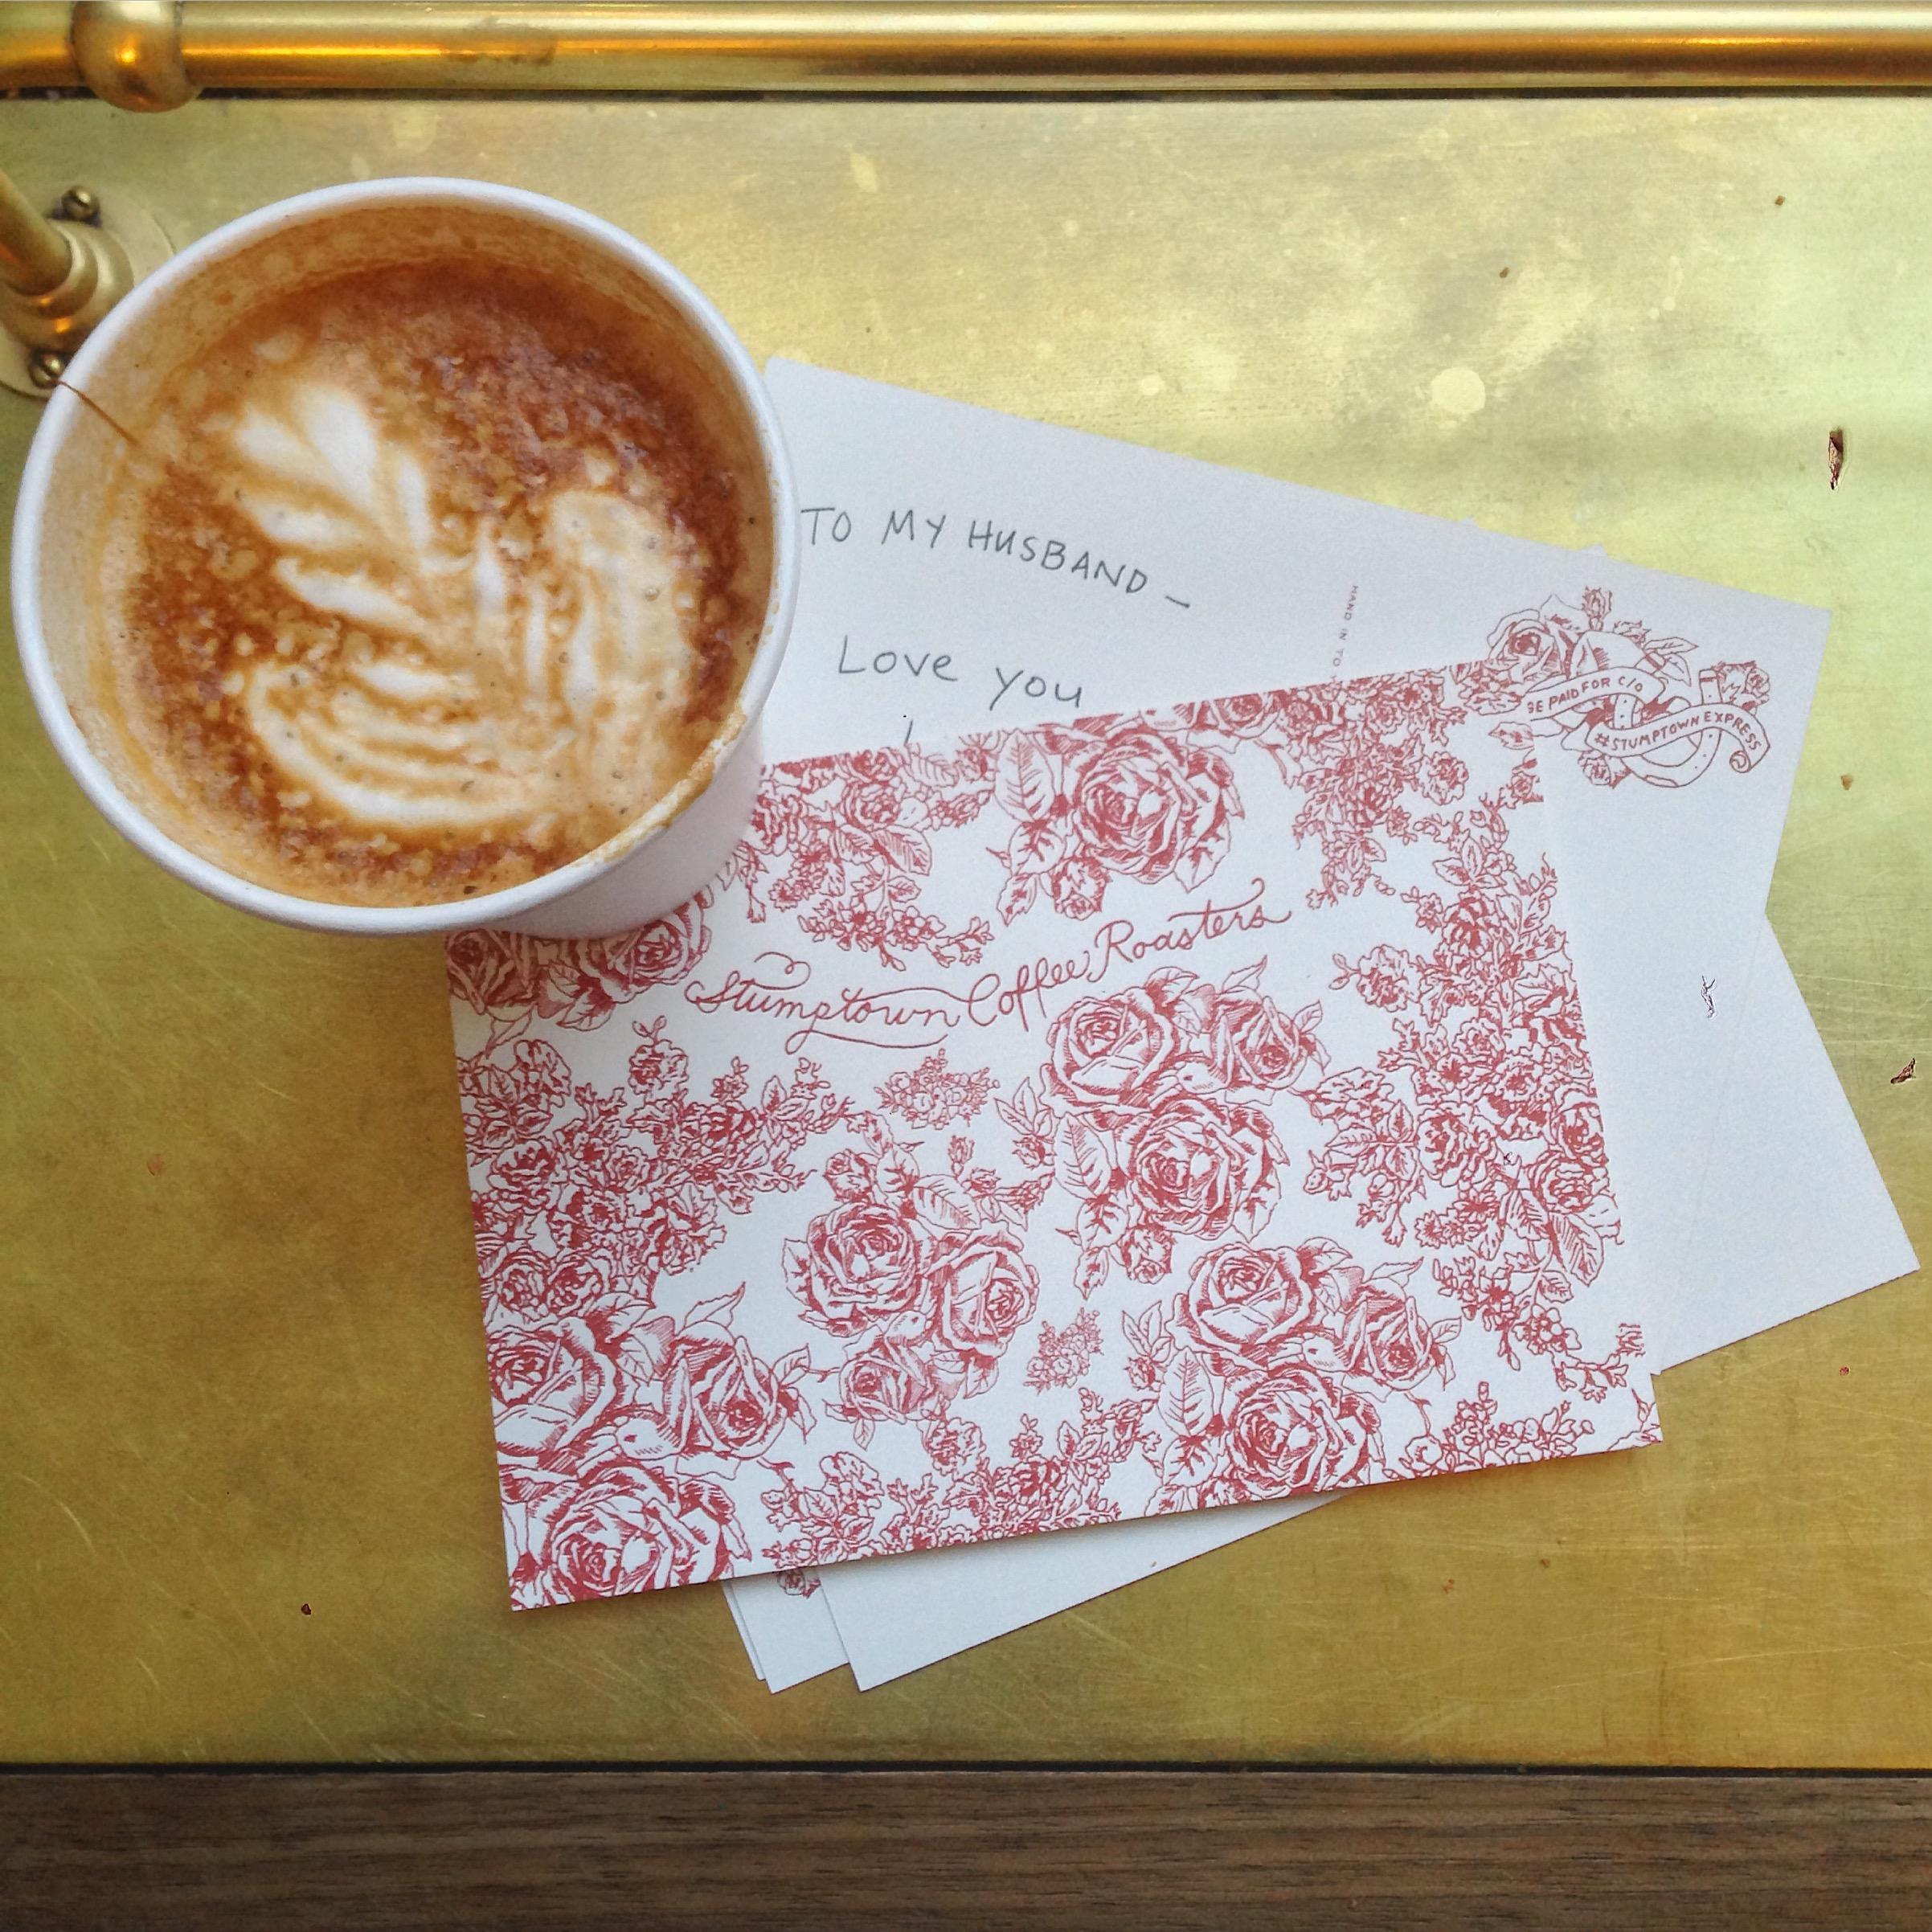 My Love Note... Photo by: Lauren L Caron